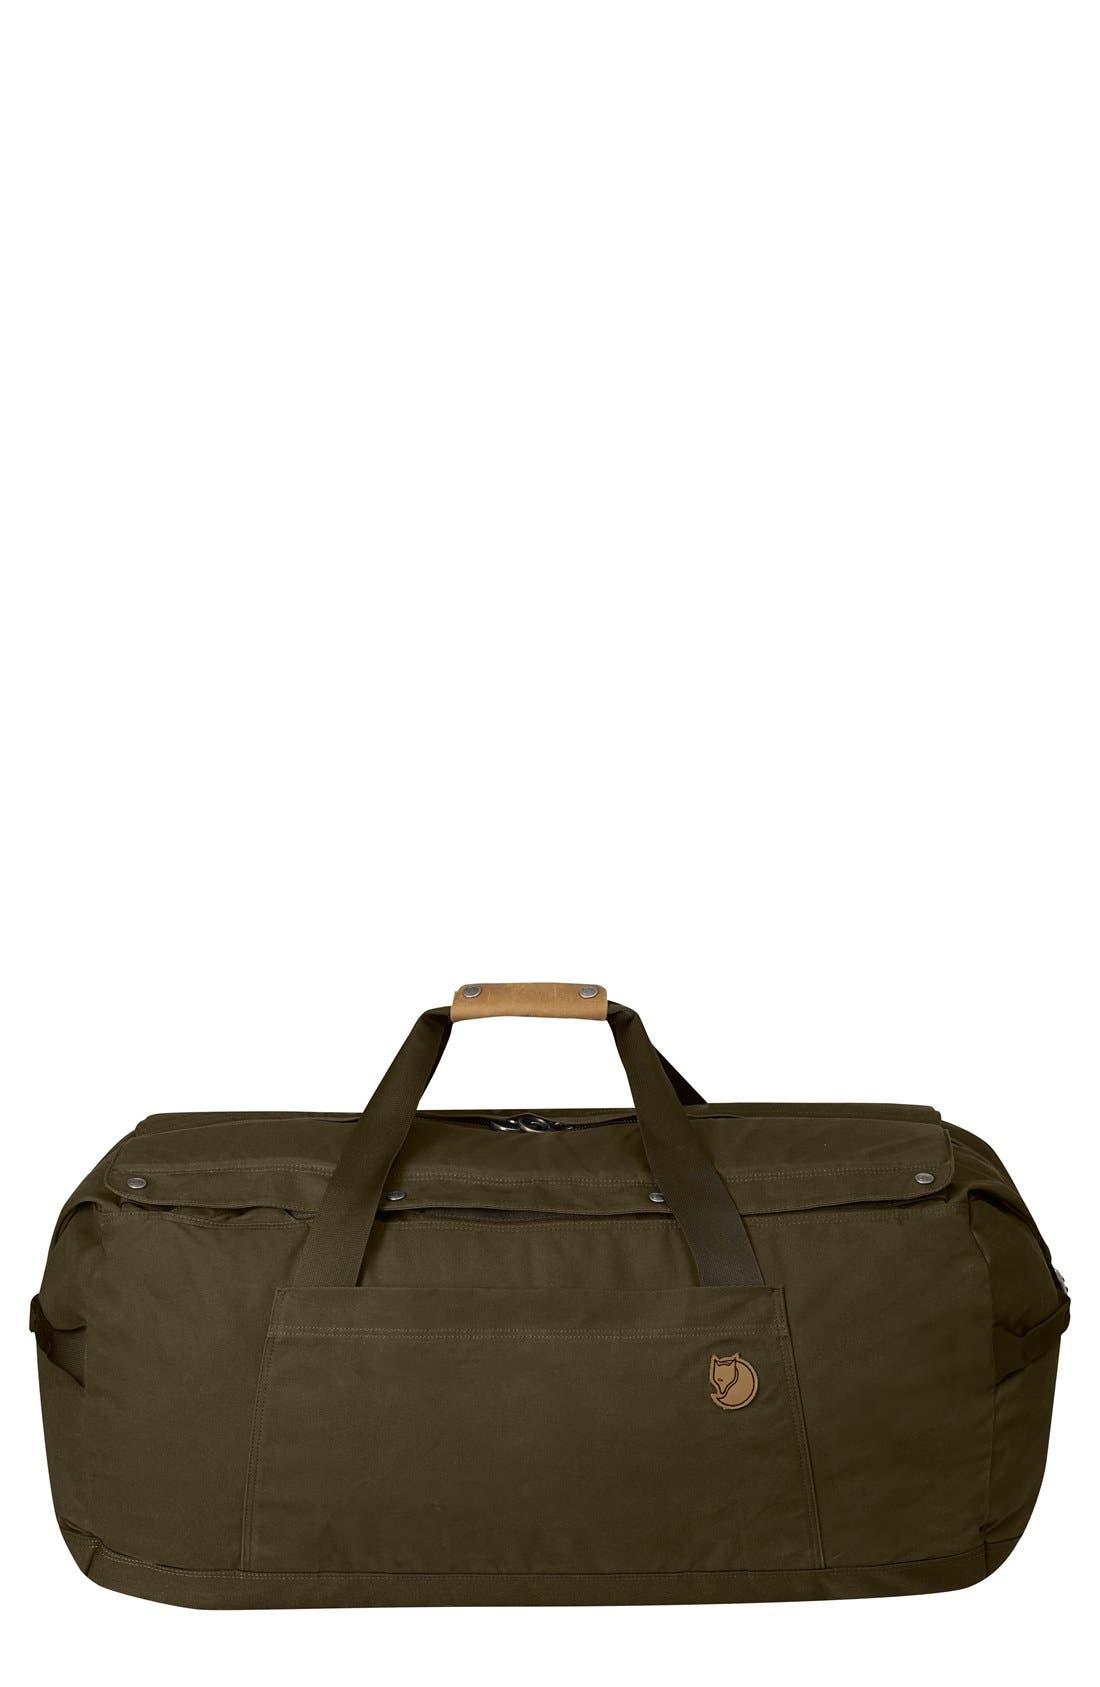 Fjällräven 'Duffel Bag No. 6' Large Duffel Bag